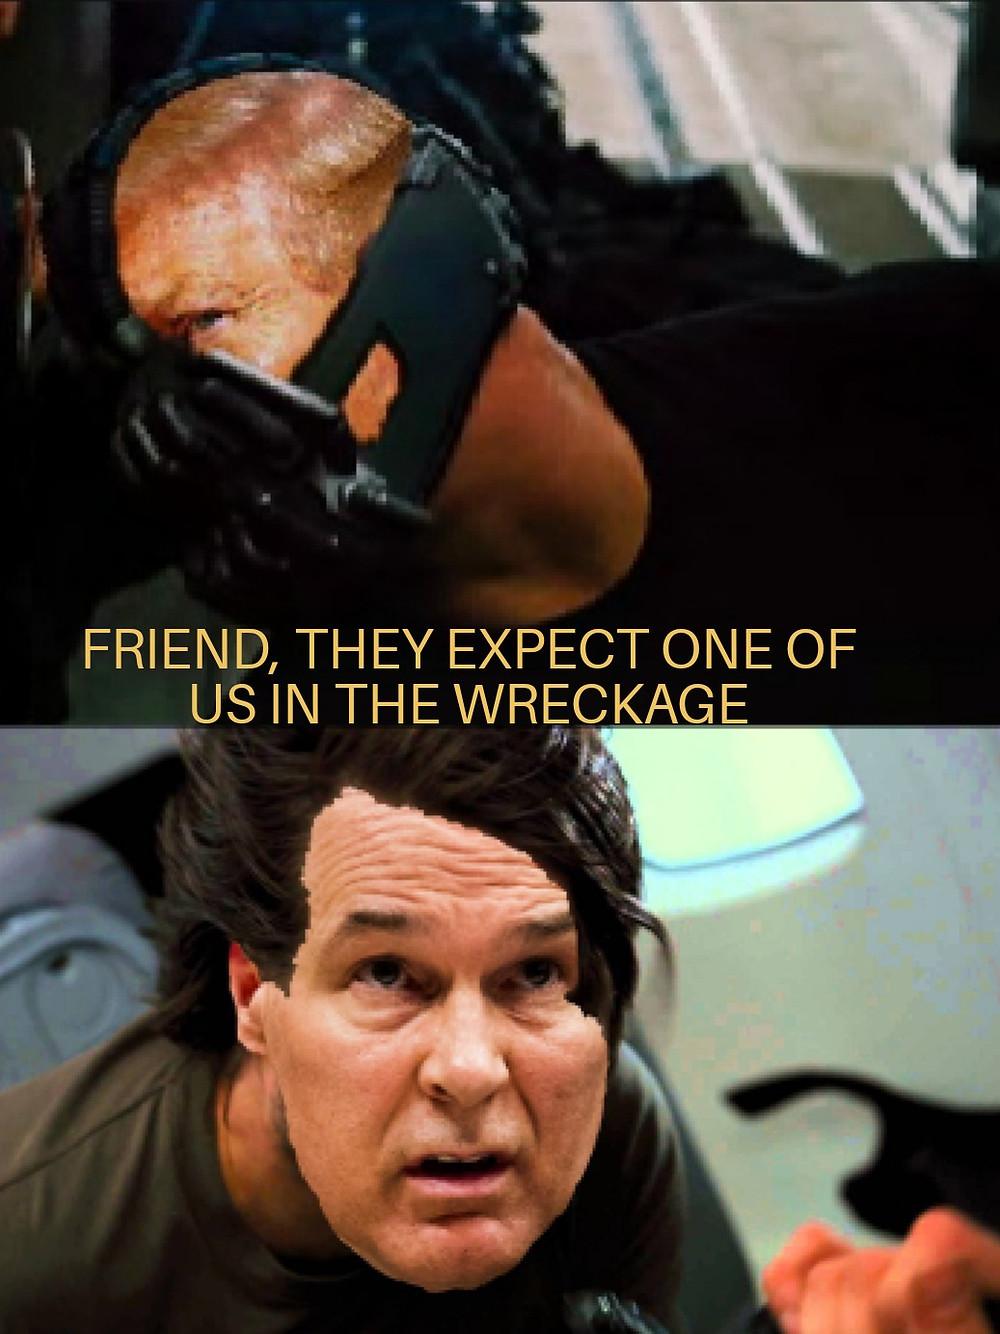 That one scene from the third Dark Knight movie